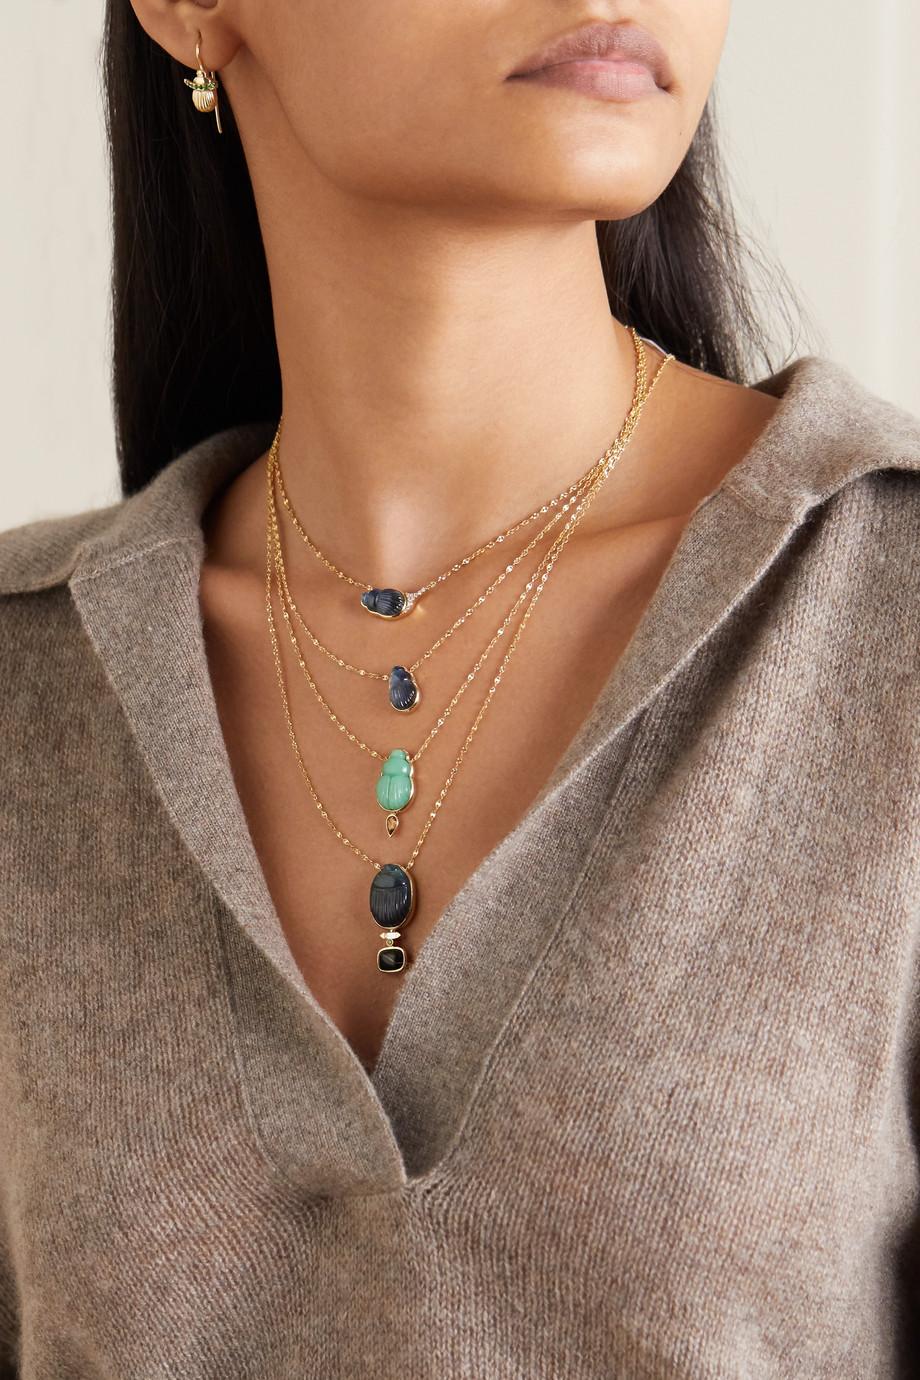 Lito Small Sienna 14-karat gold, labradorite and diamond necklace